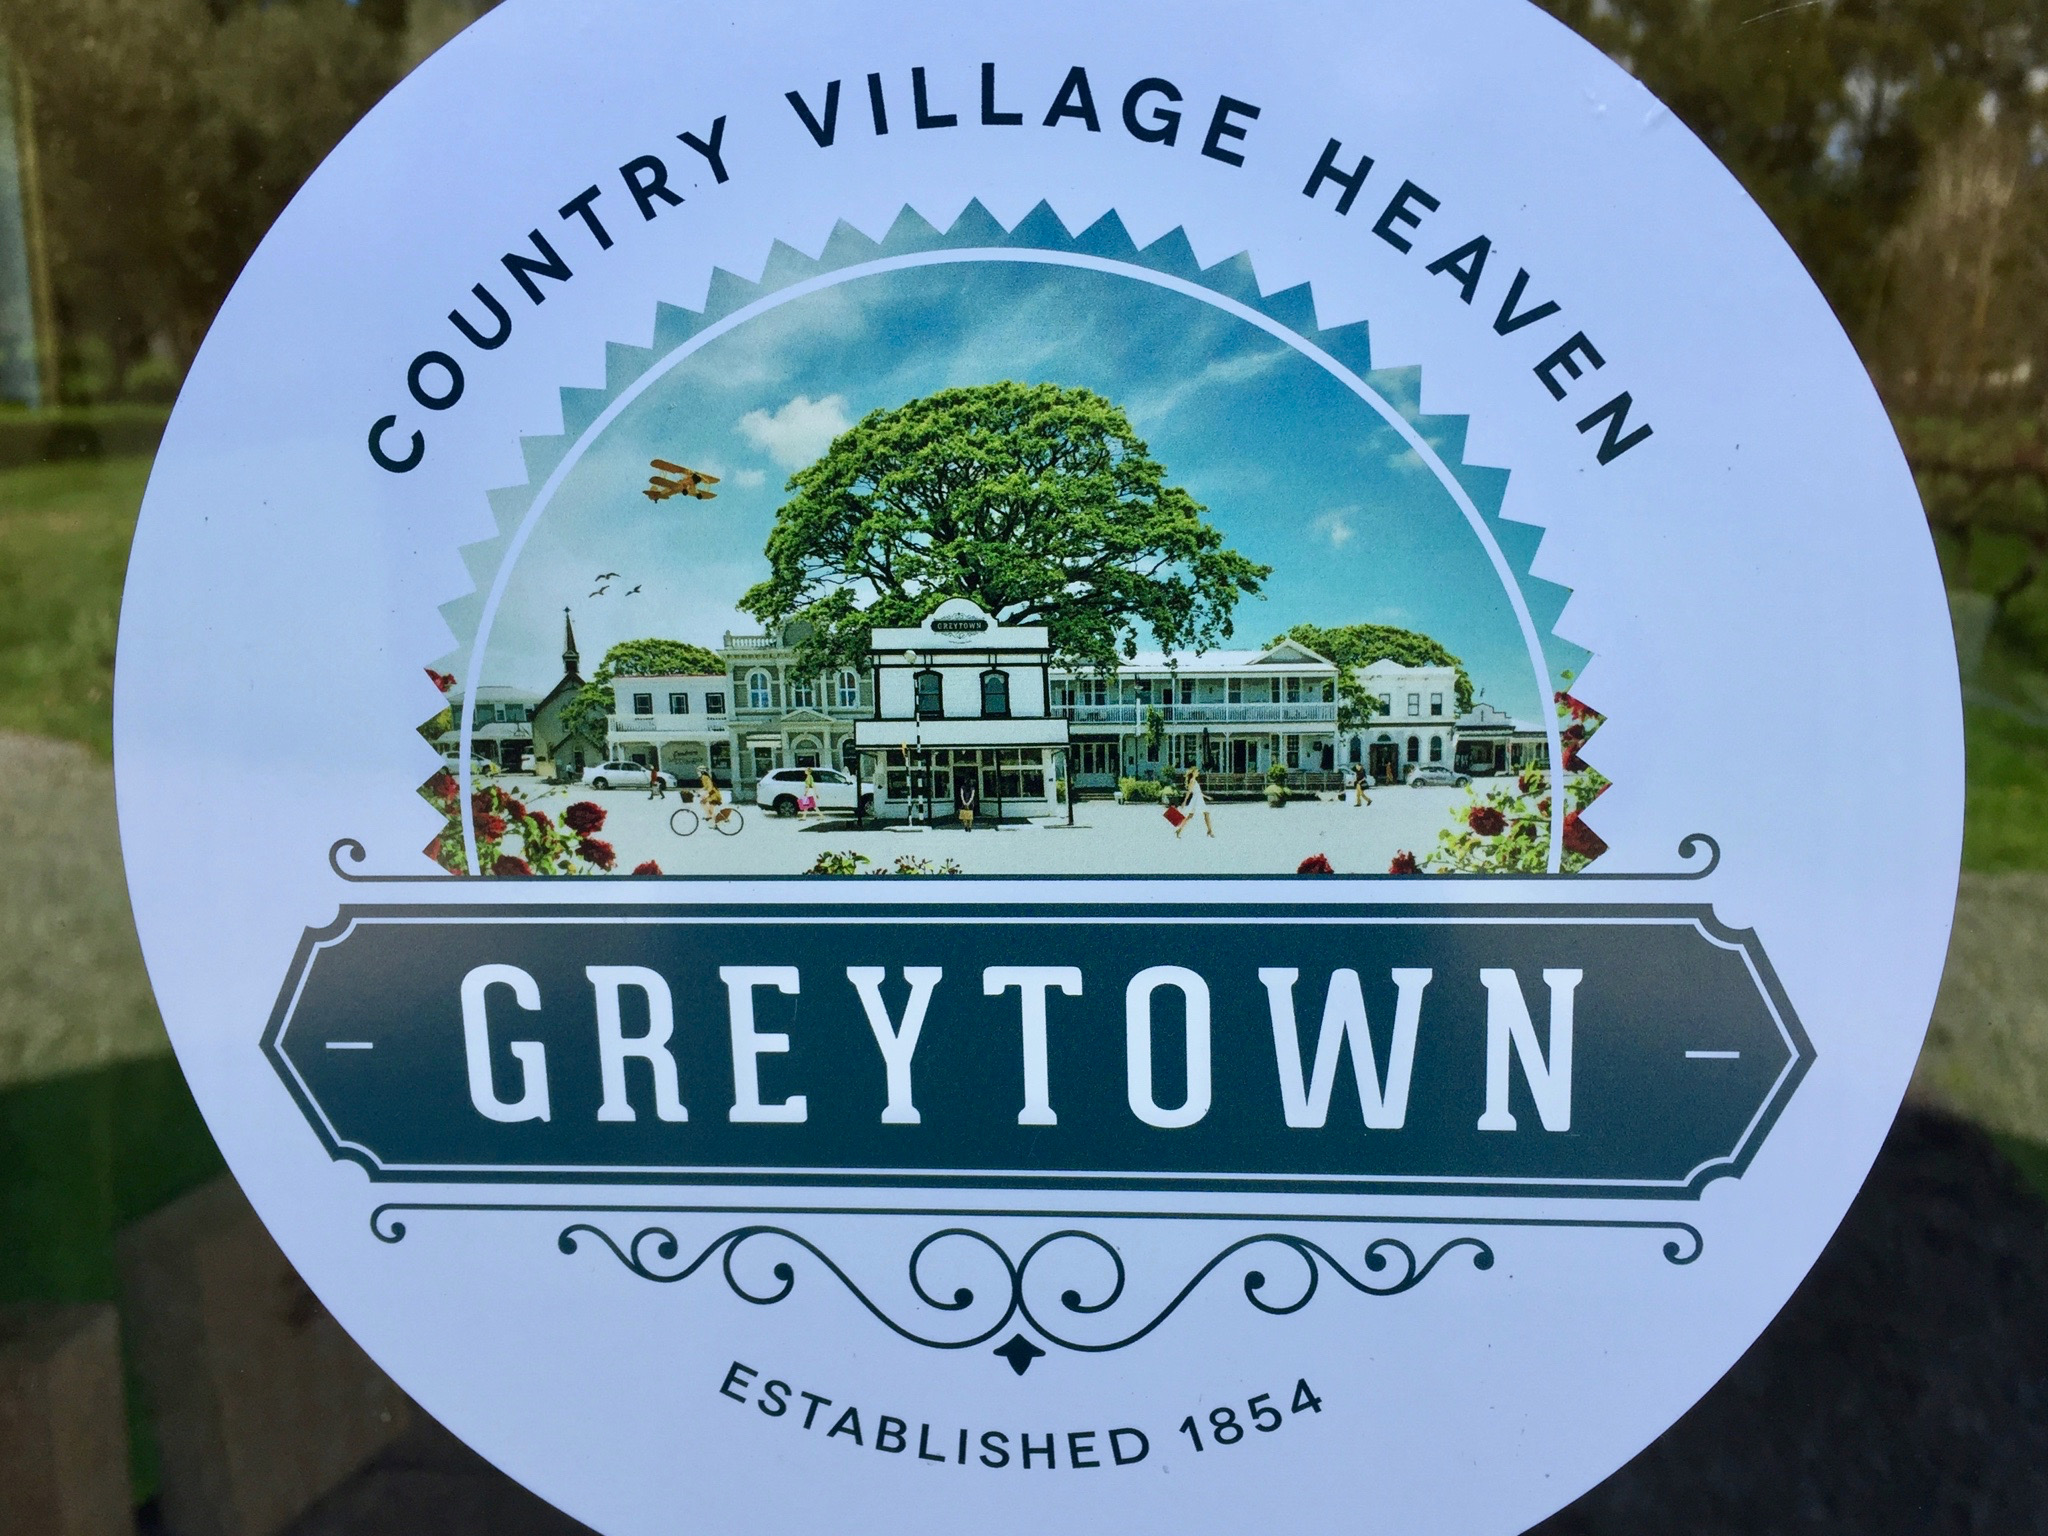 Country Village Heaven, Greytown